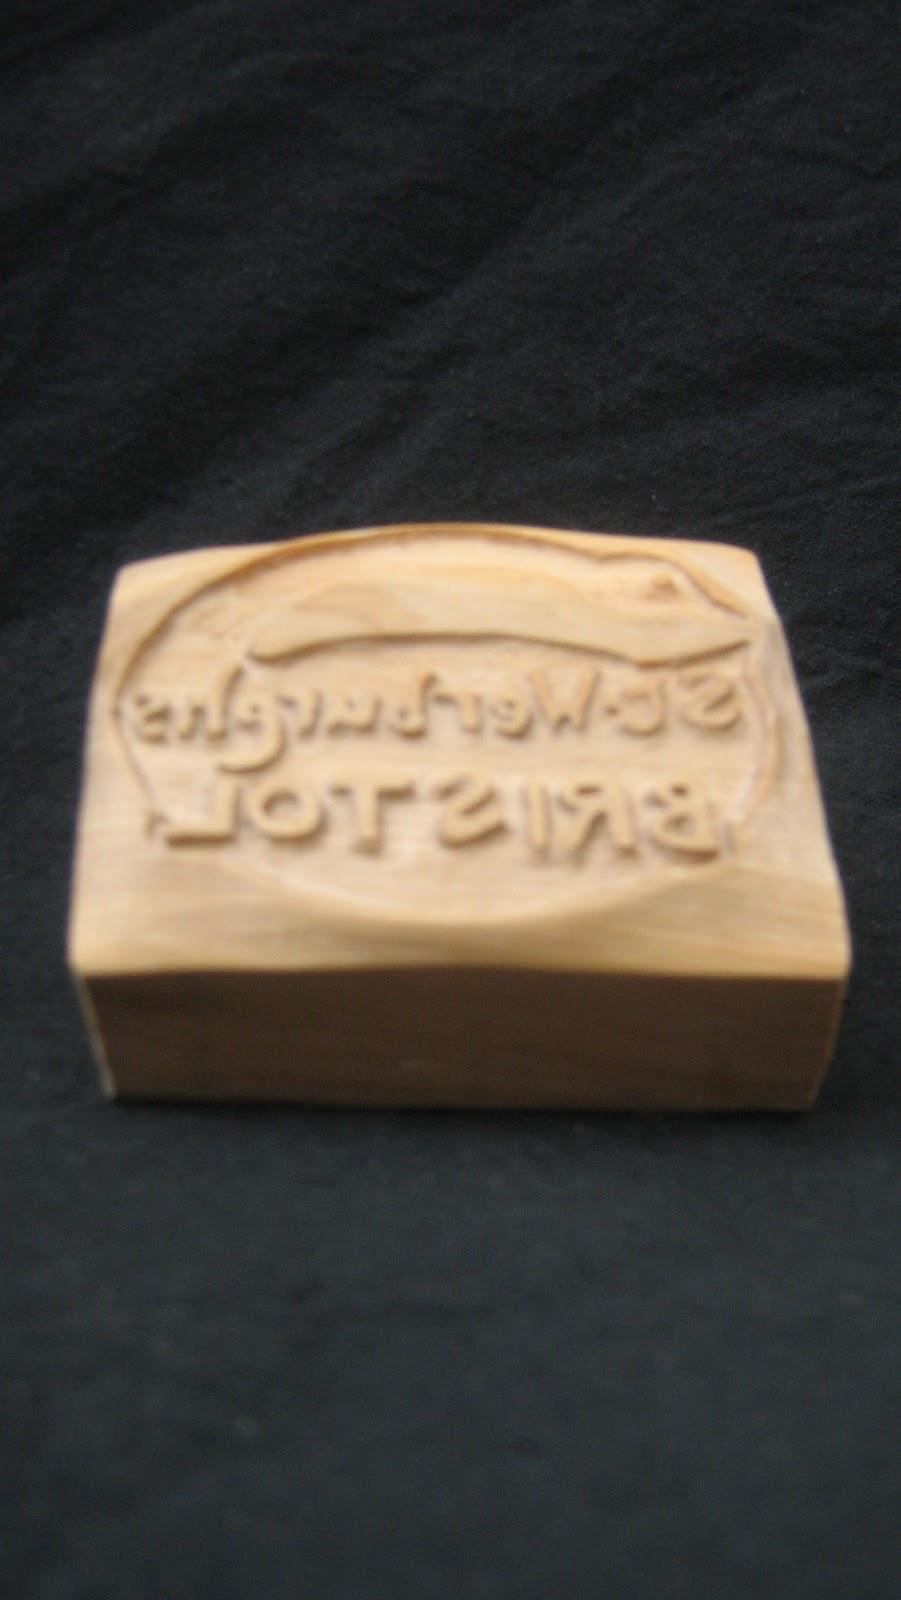 Wooden stamps for steve carter of saint werburghs pottery